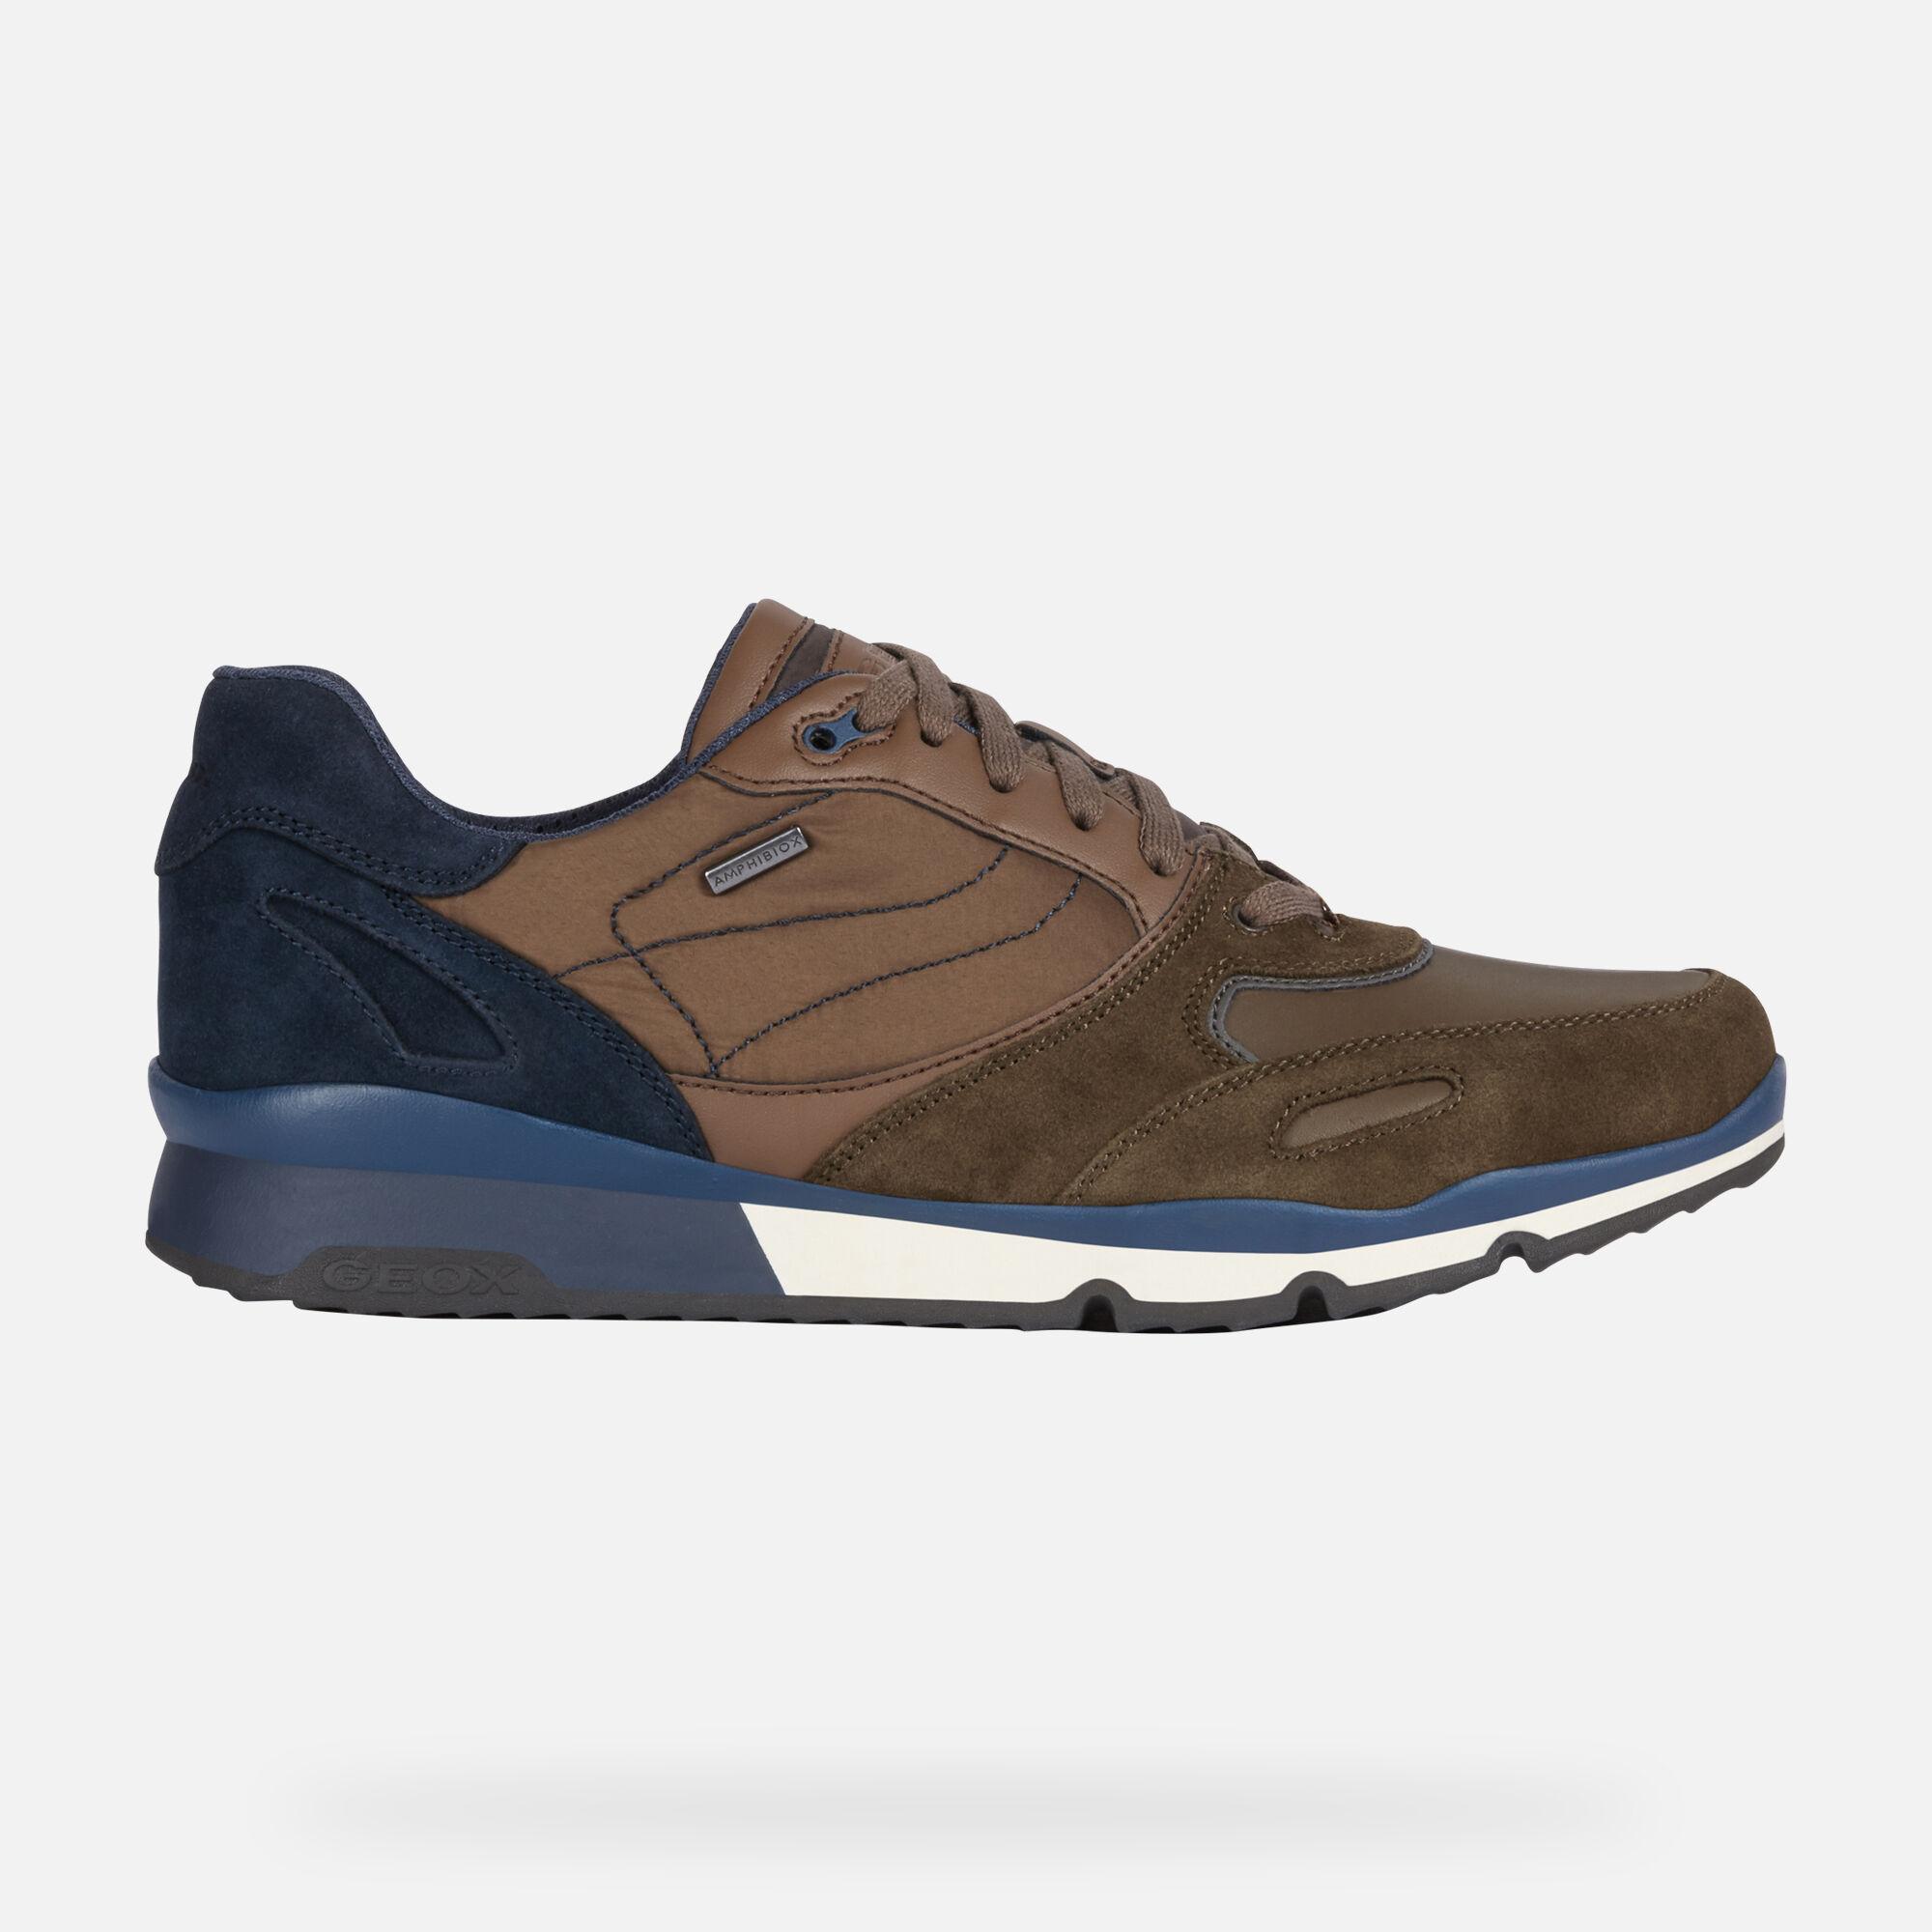 Geox SANDFORD B ABX Uomo: Sneakers Basse Oliva scuro | Geox ®